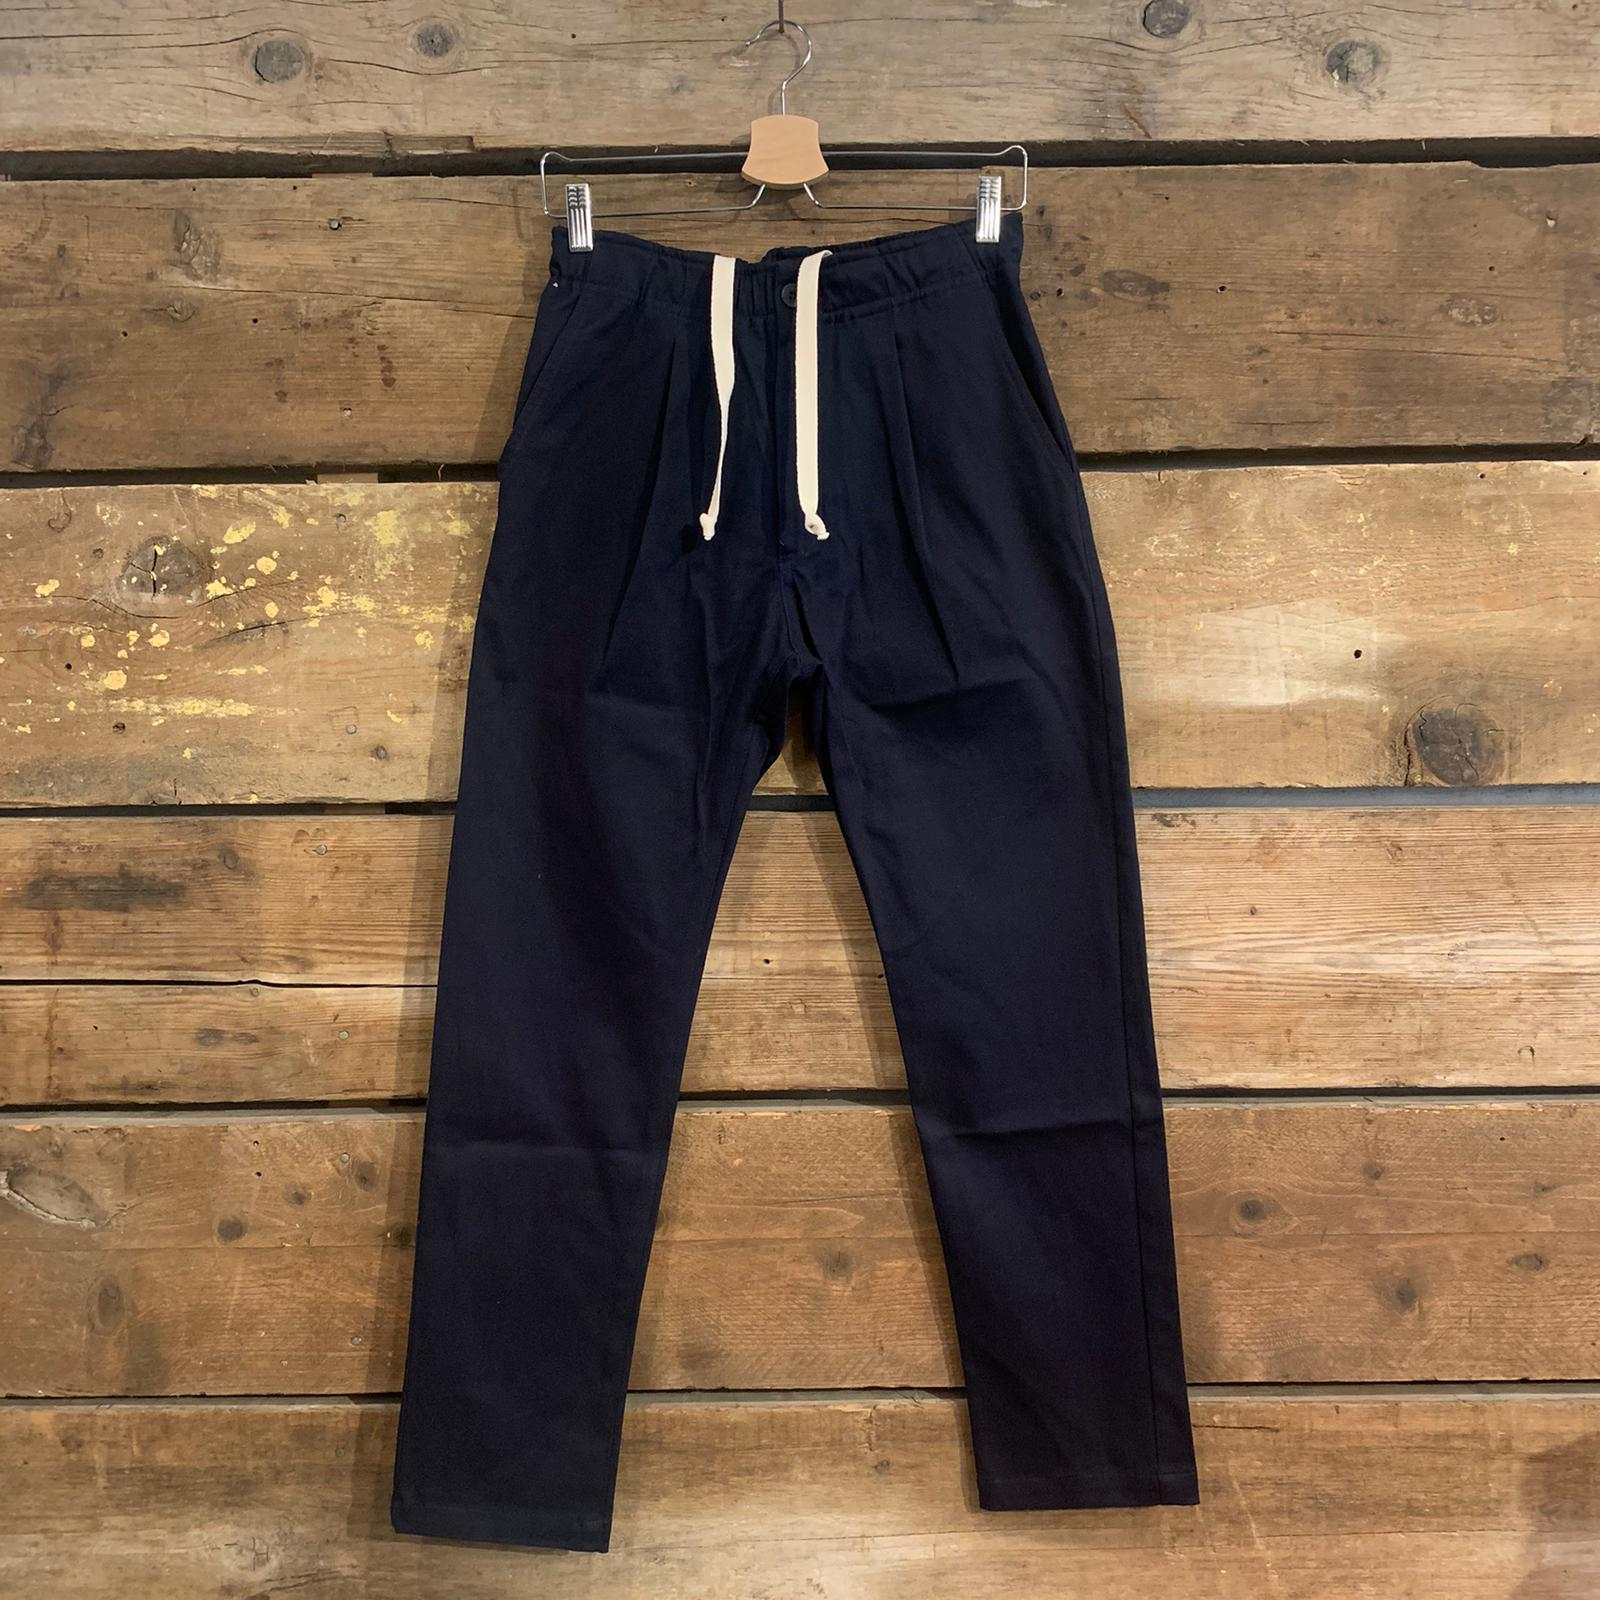 Pantalone Bakery Lowan Gabardine Con Bottone E Coulisse Blu Navy